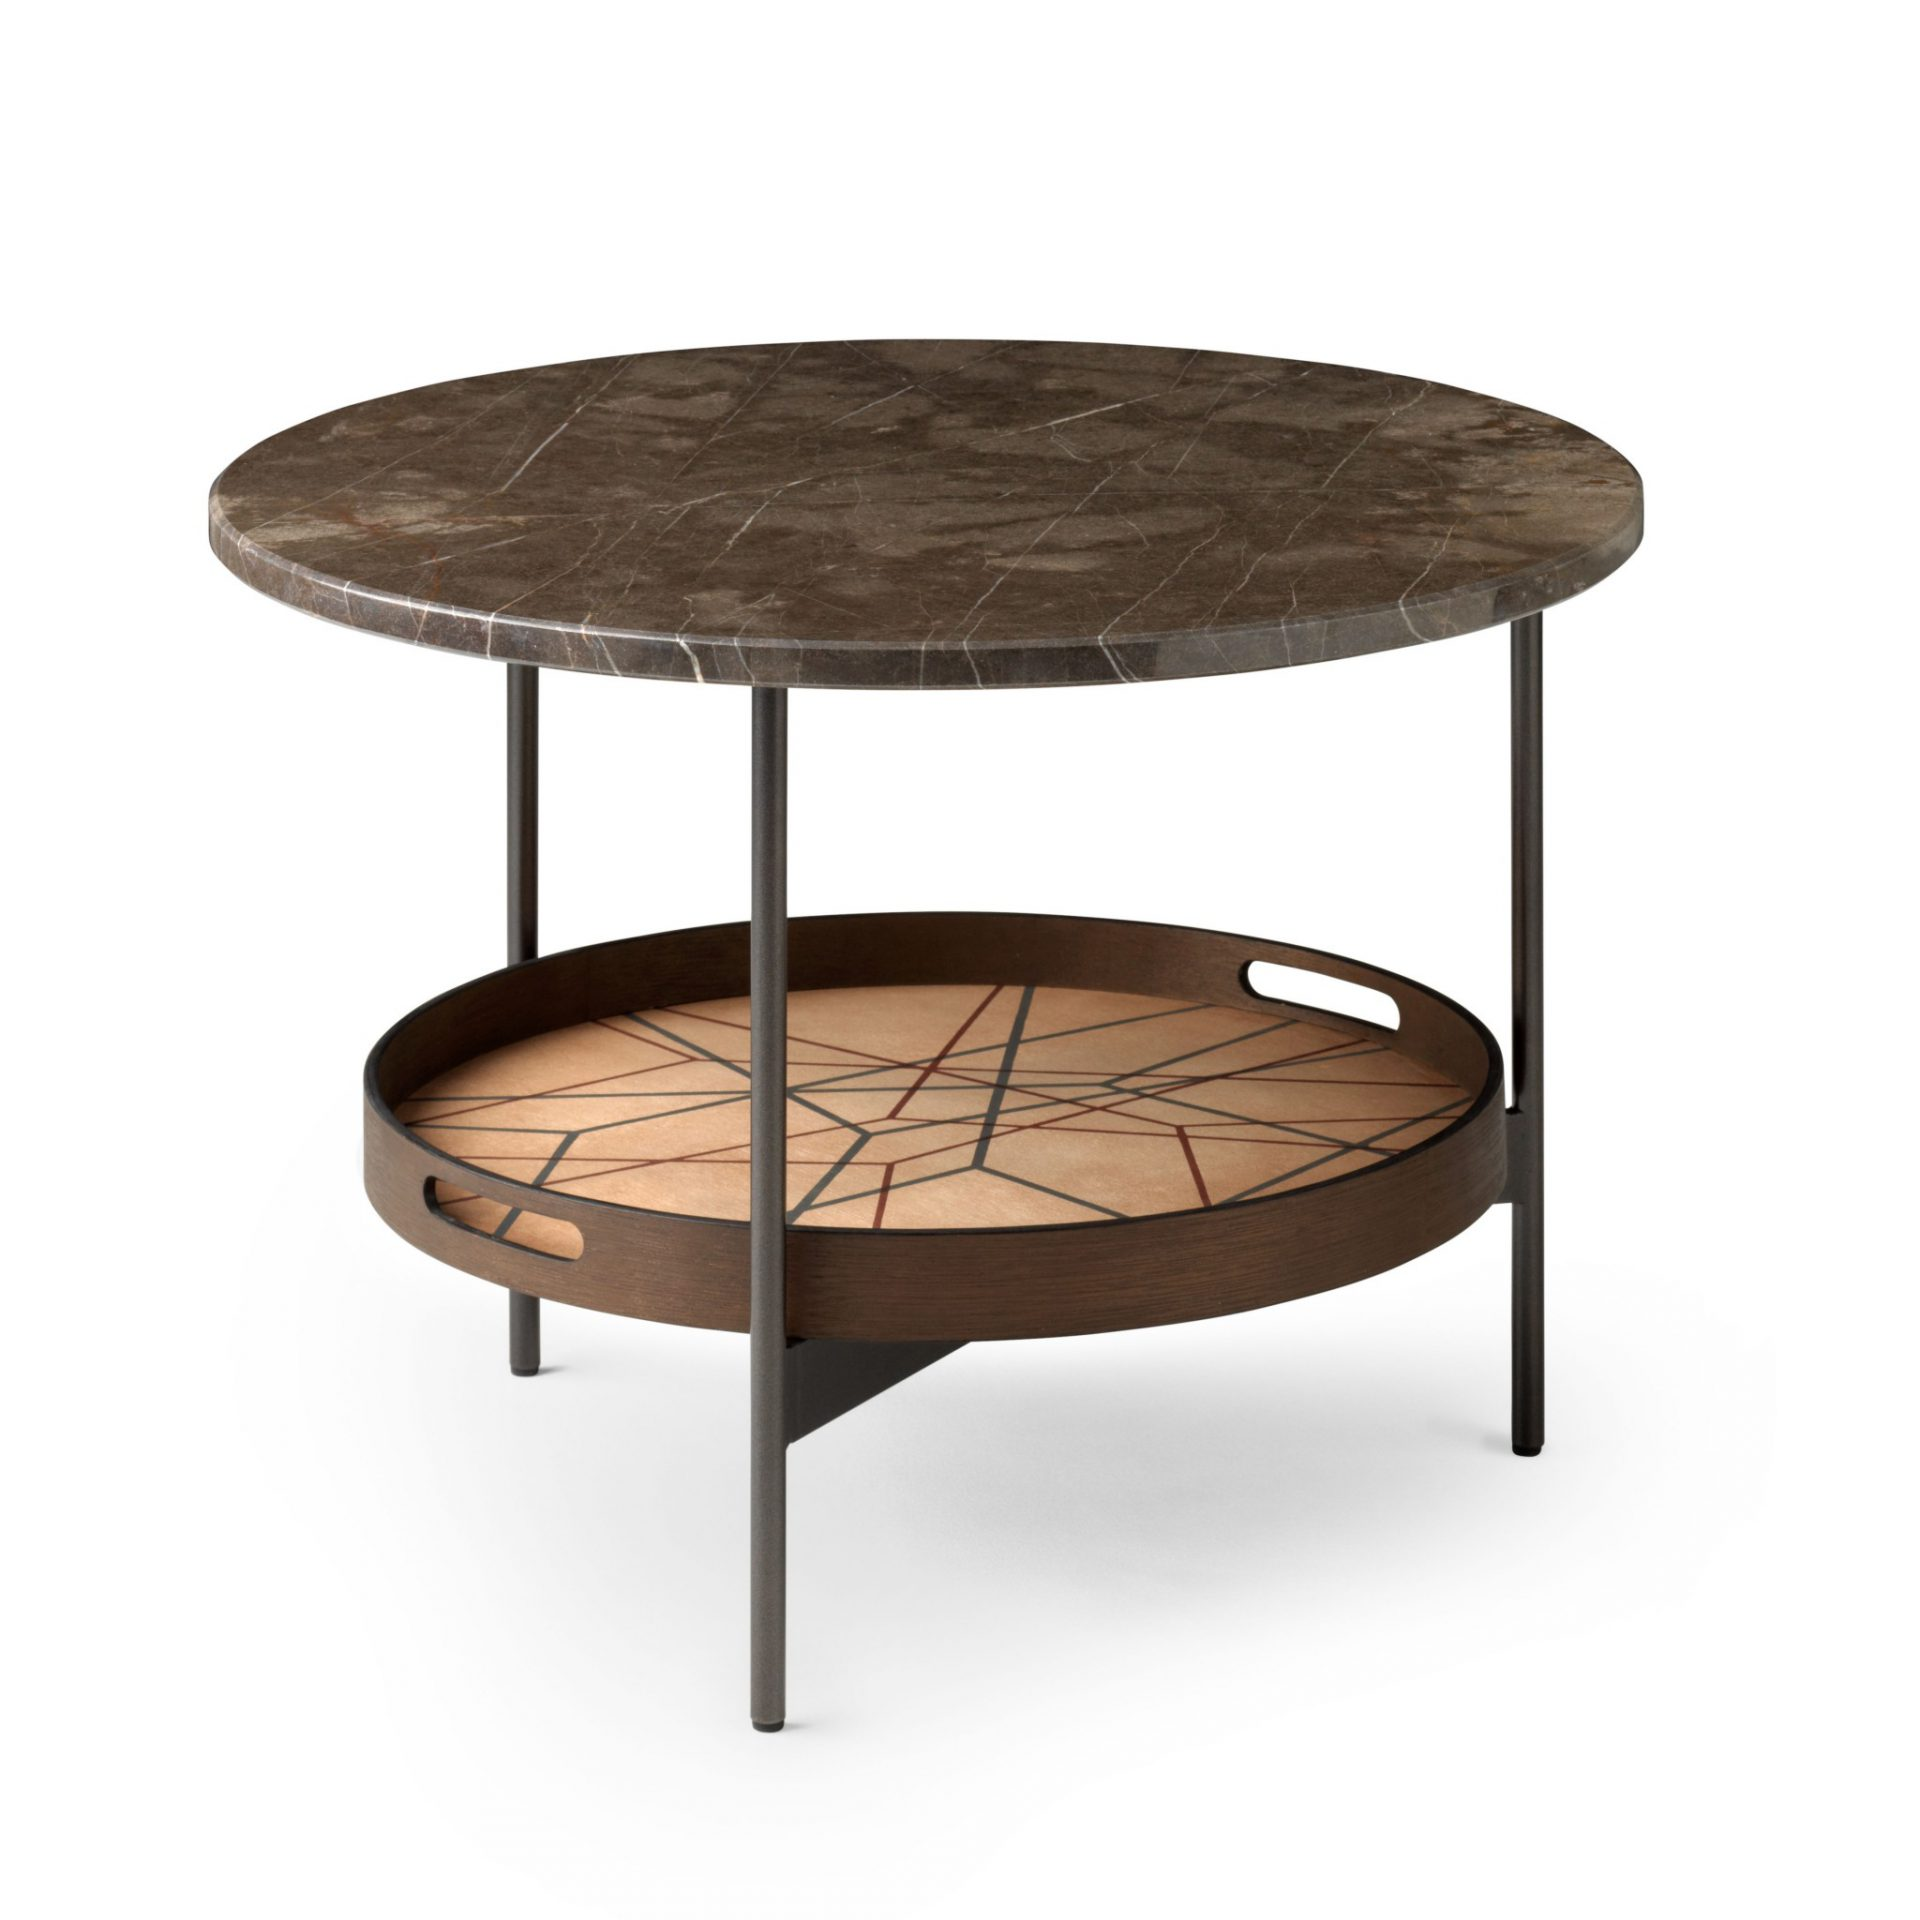 Leolux salontafel Round